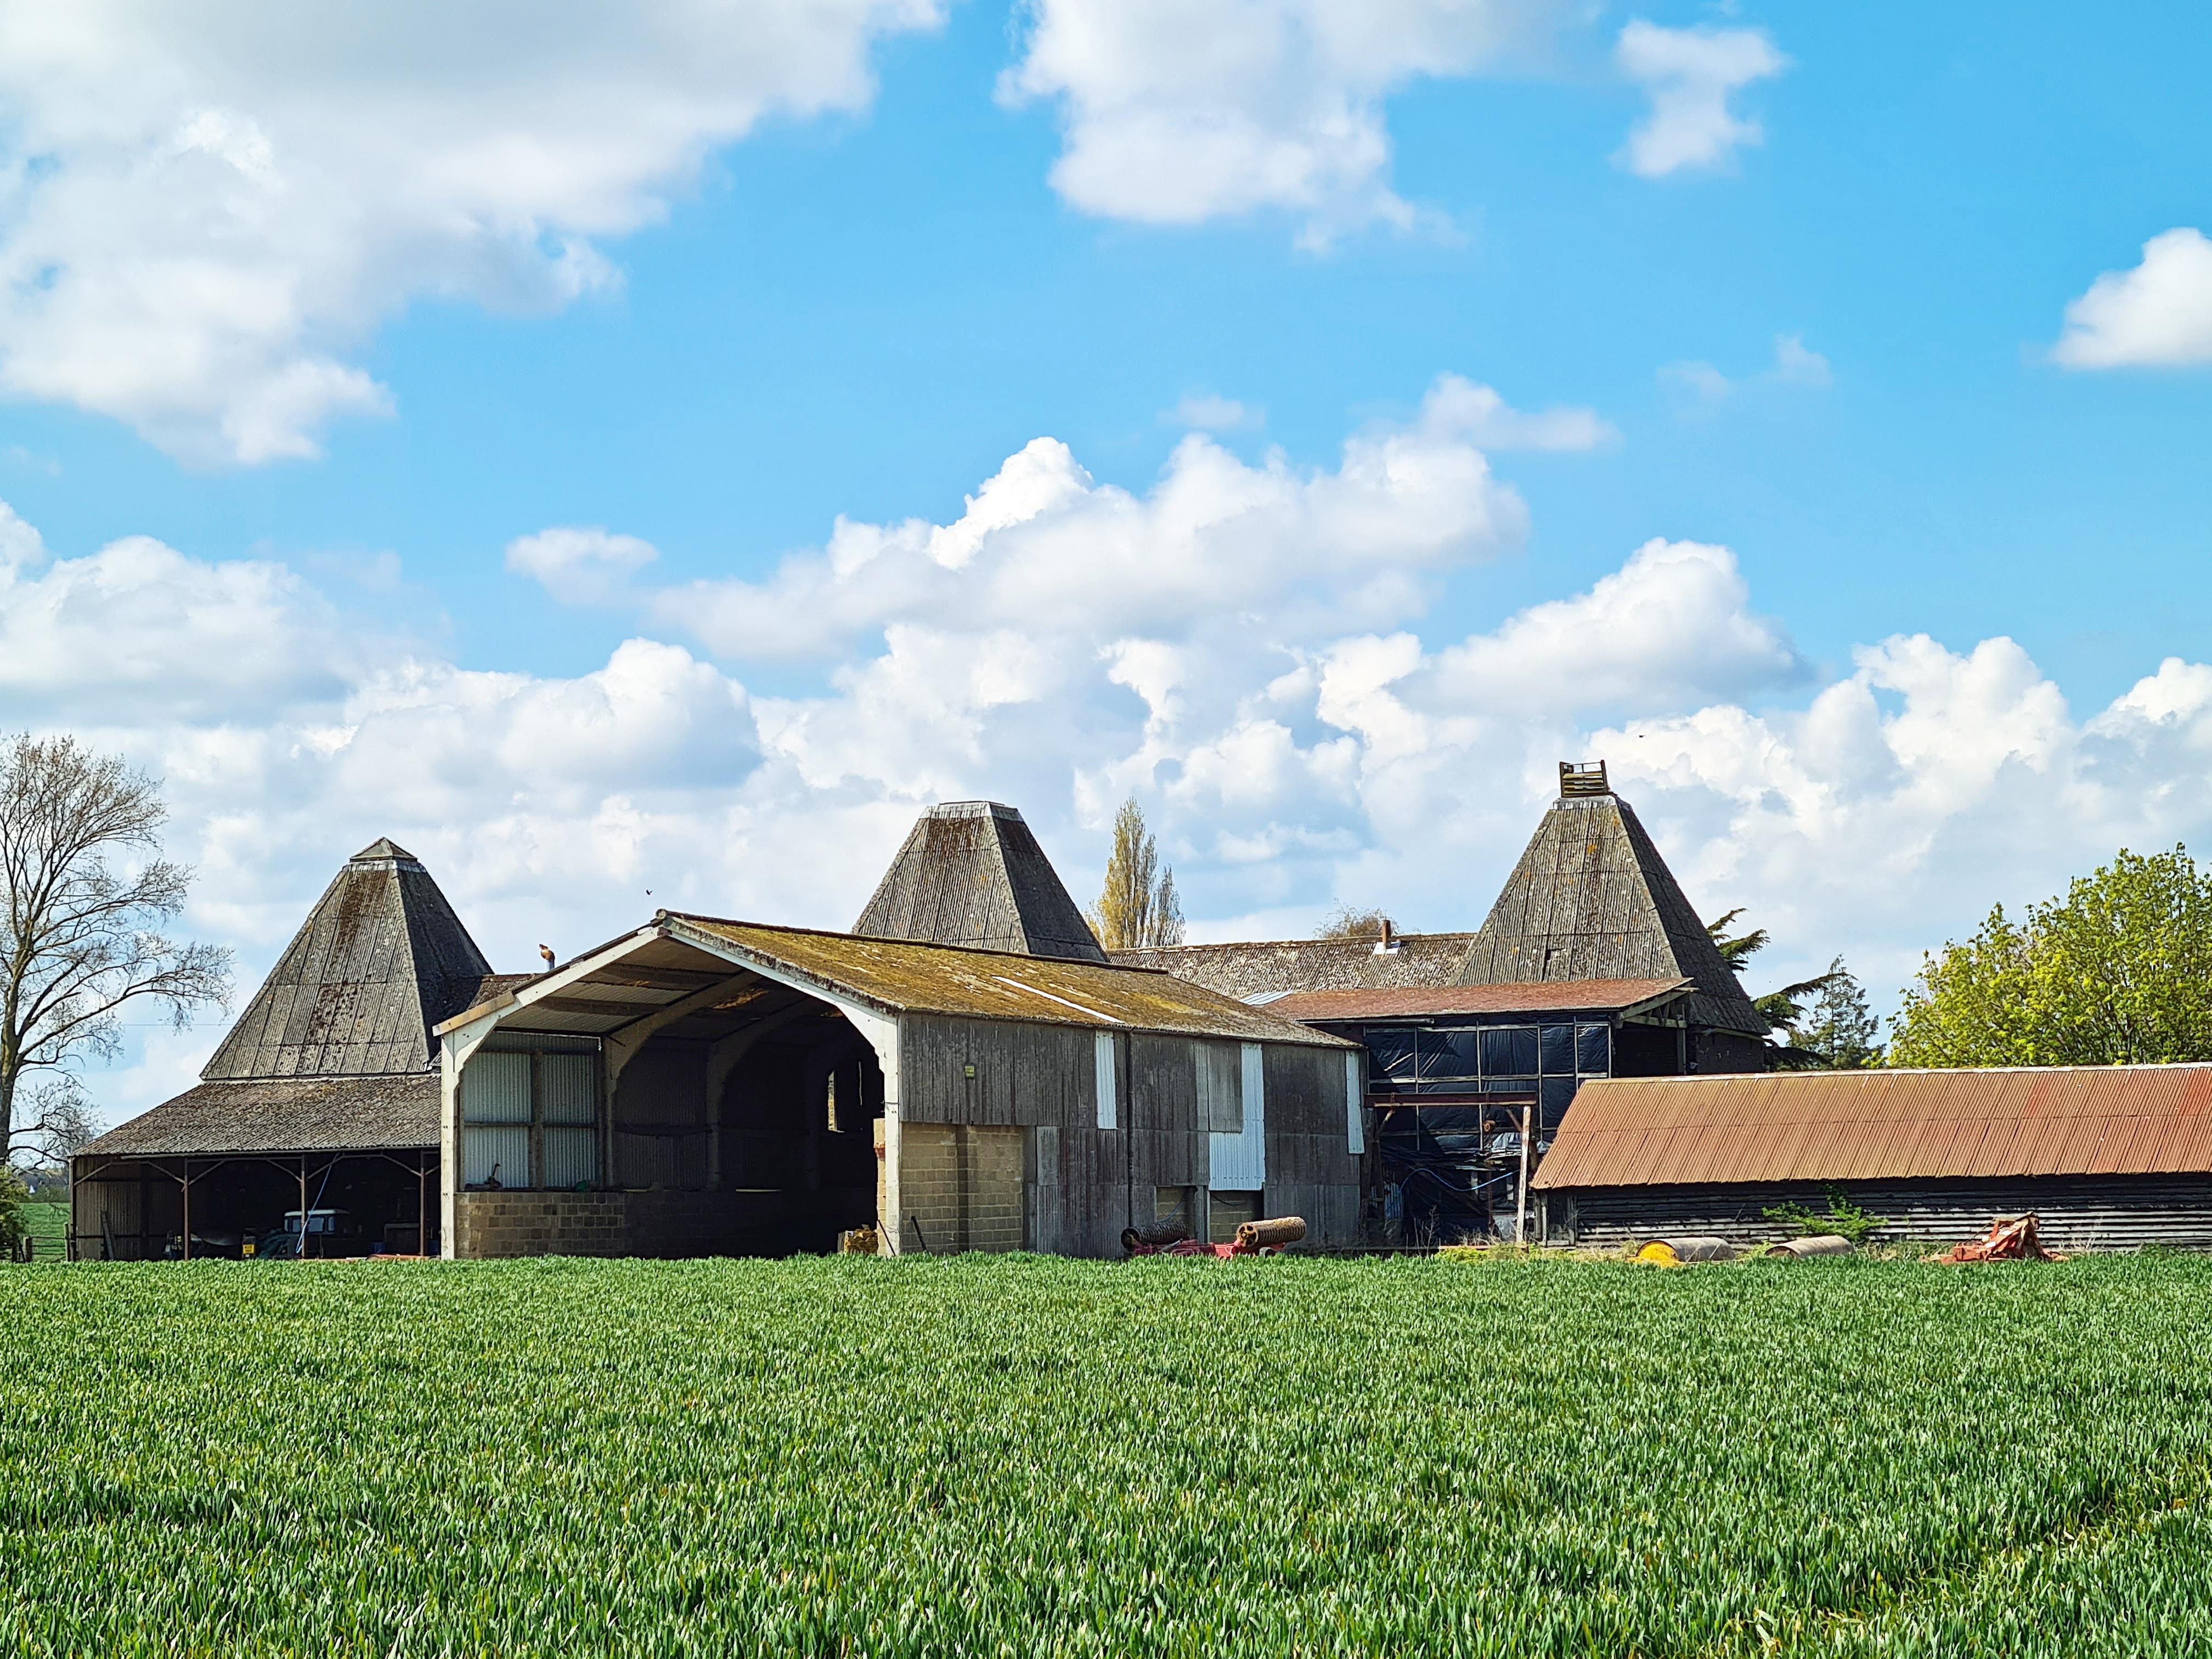 Farm buildings at Luddenham Court